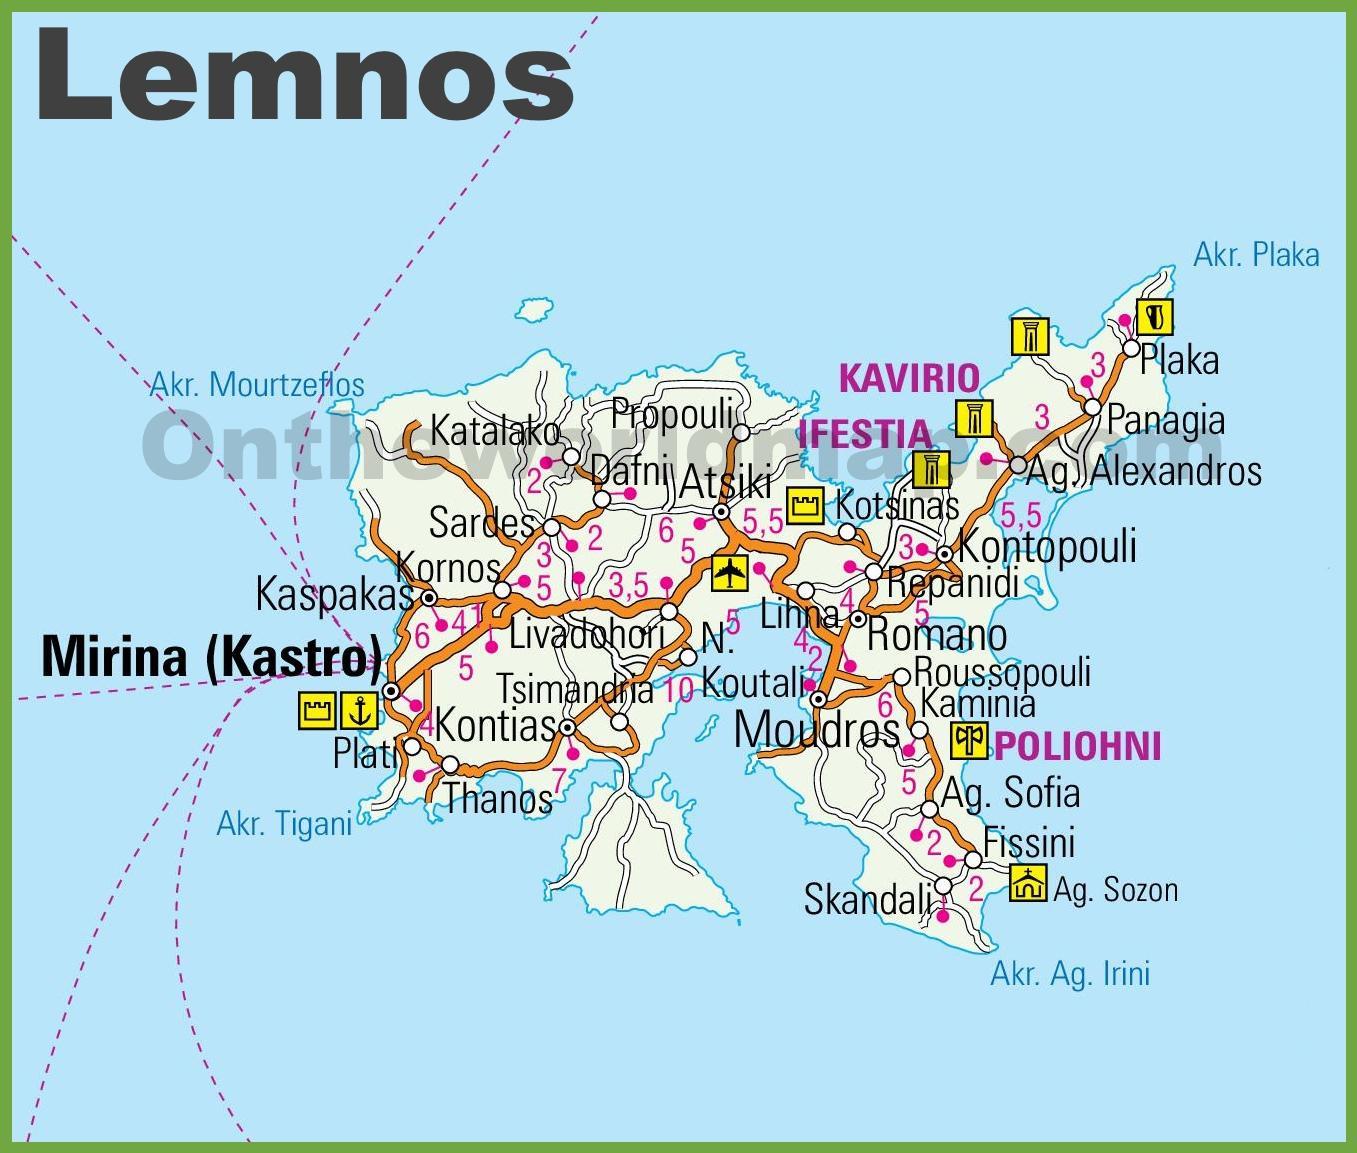 Lemnos Greece Map Lemnos Map Greece Southern Europe Europe